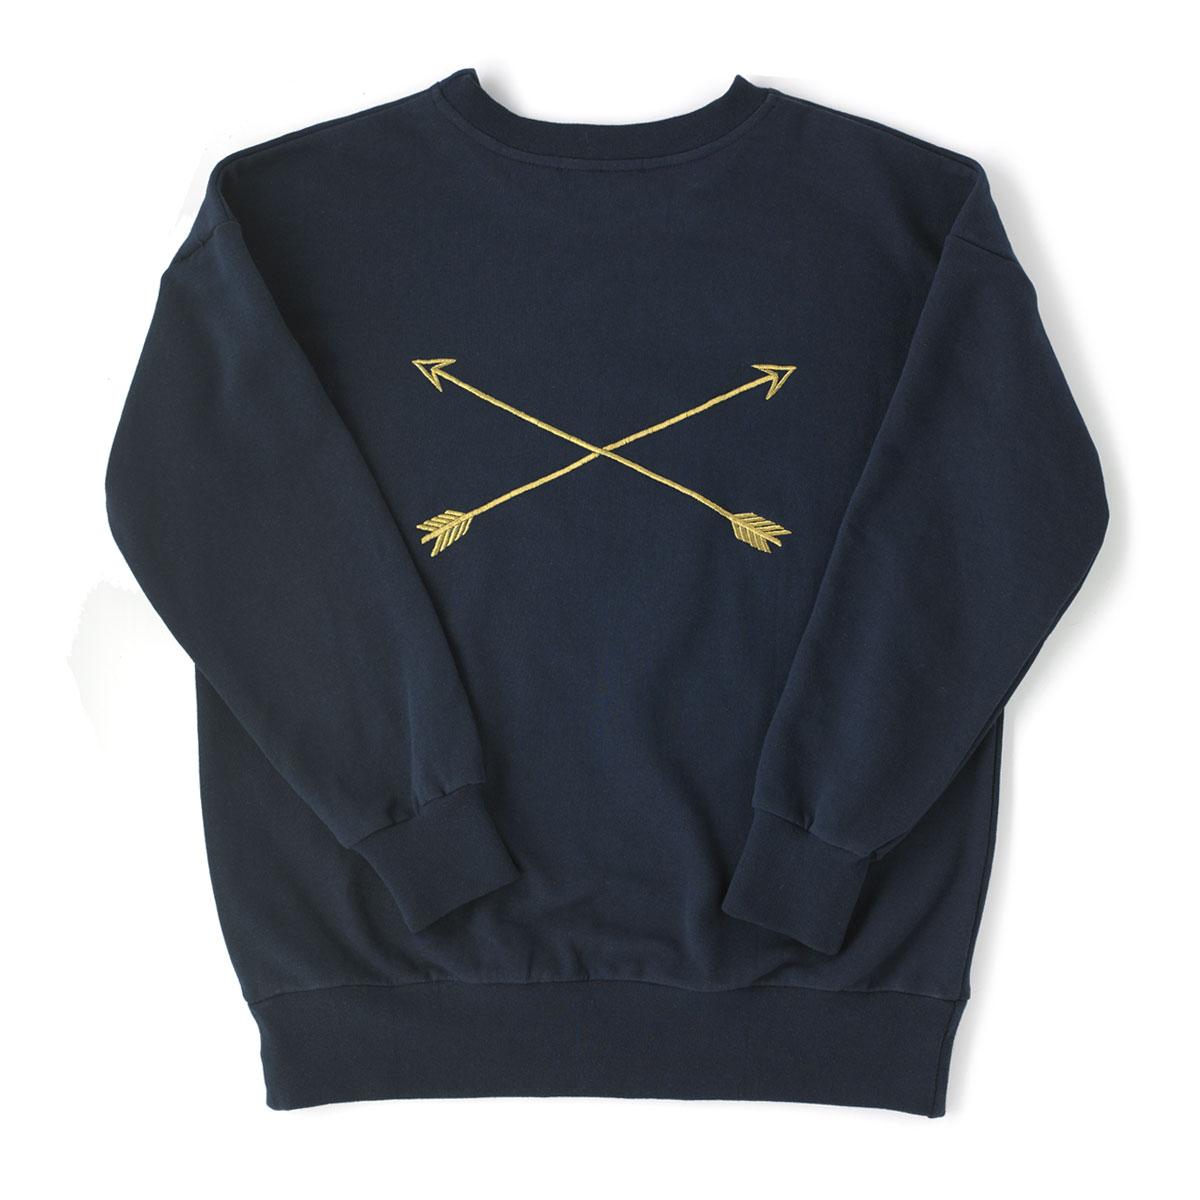 KALE SWEAT Embroidered, cotton sweatshirt. Back